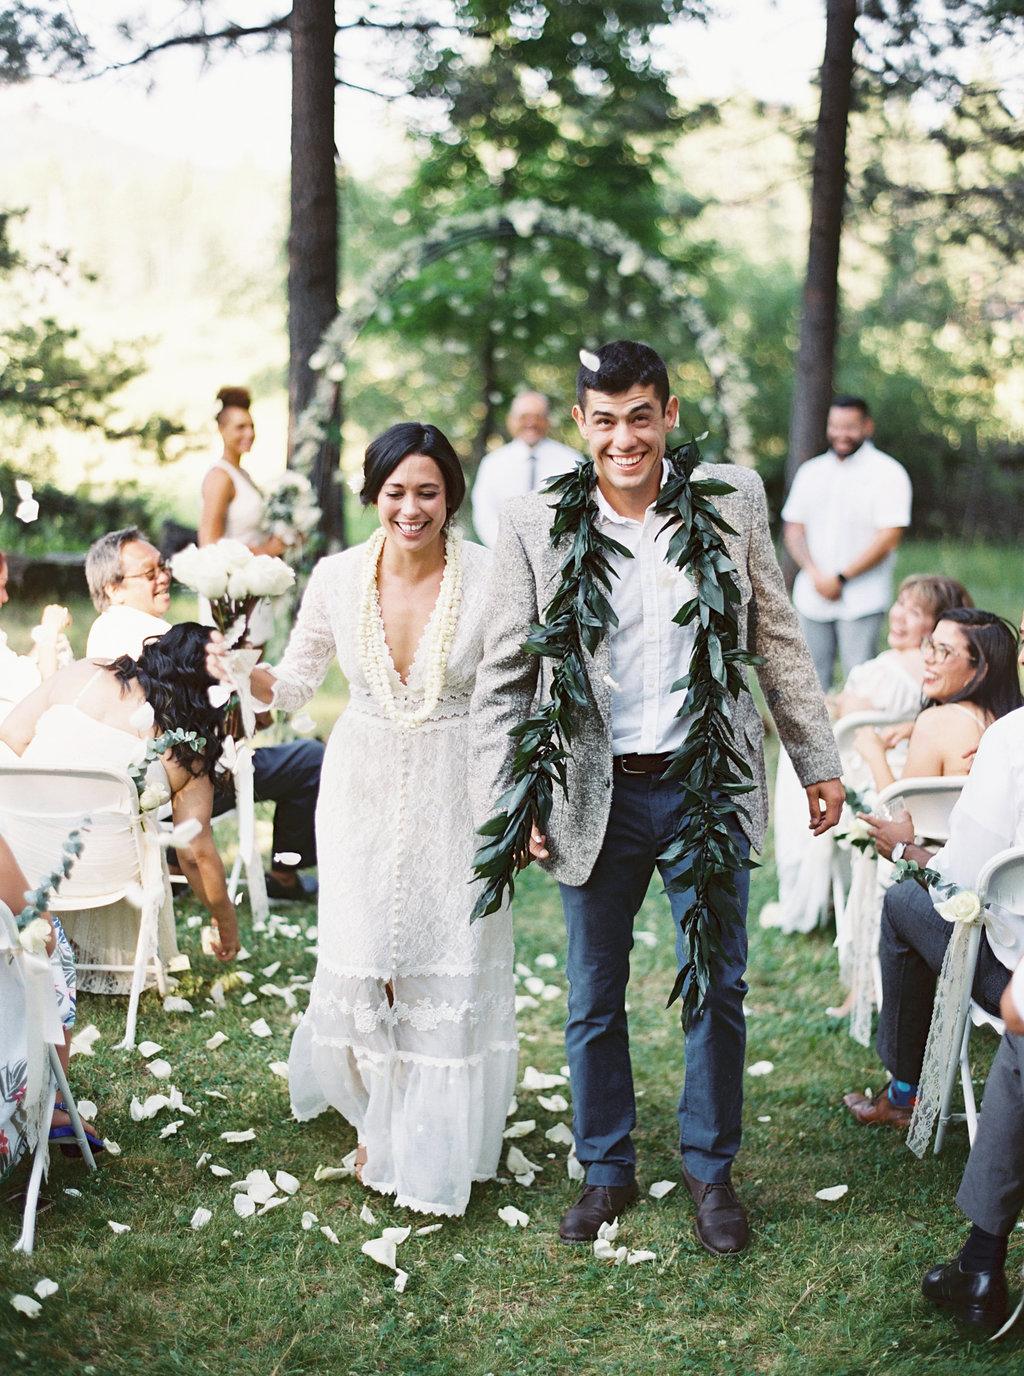 000024_gallardo_wedding_film0056.jpg